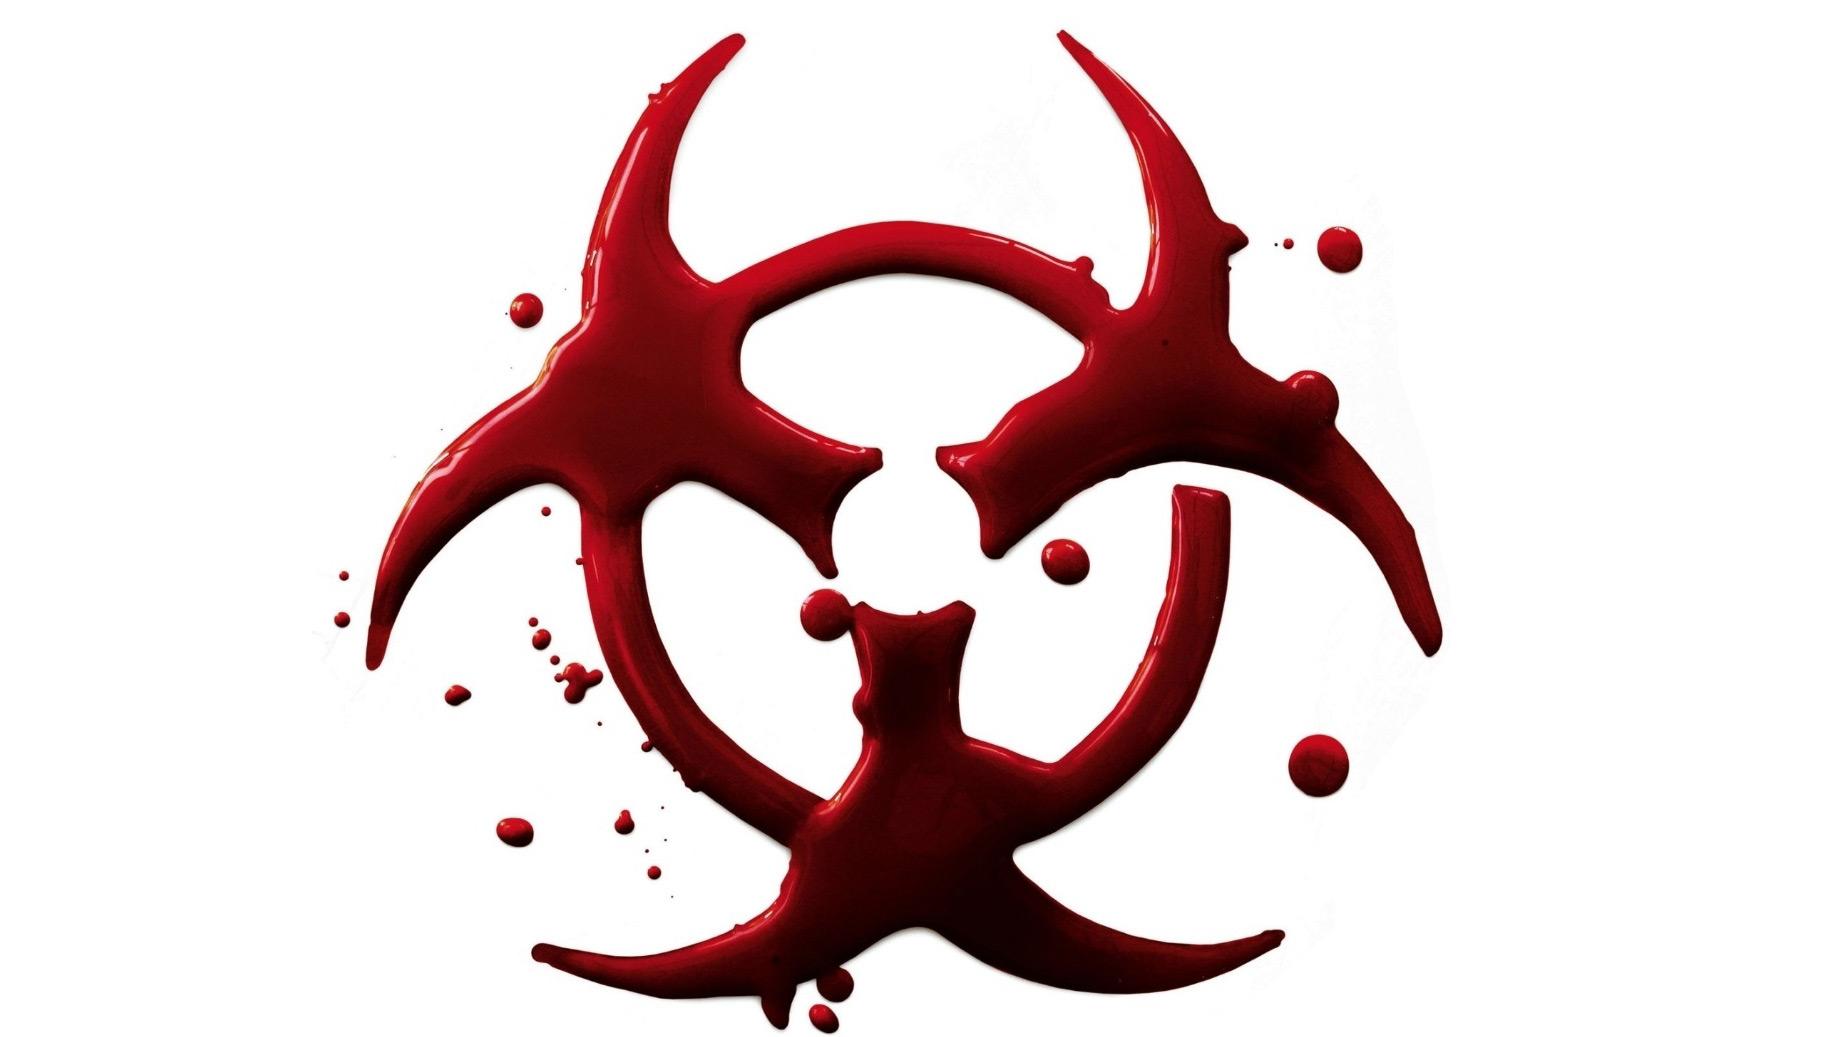 Bio Hazard Google Cover